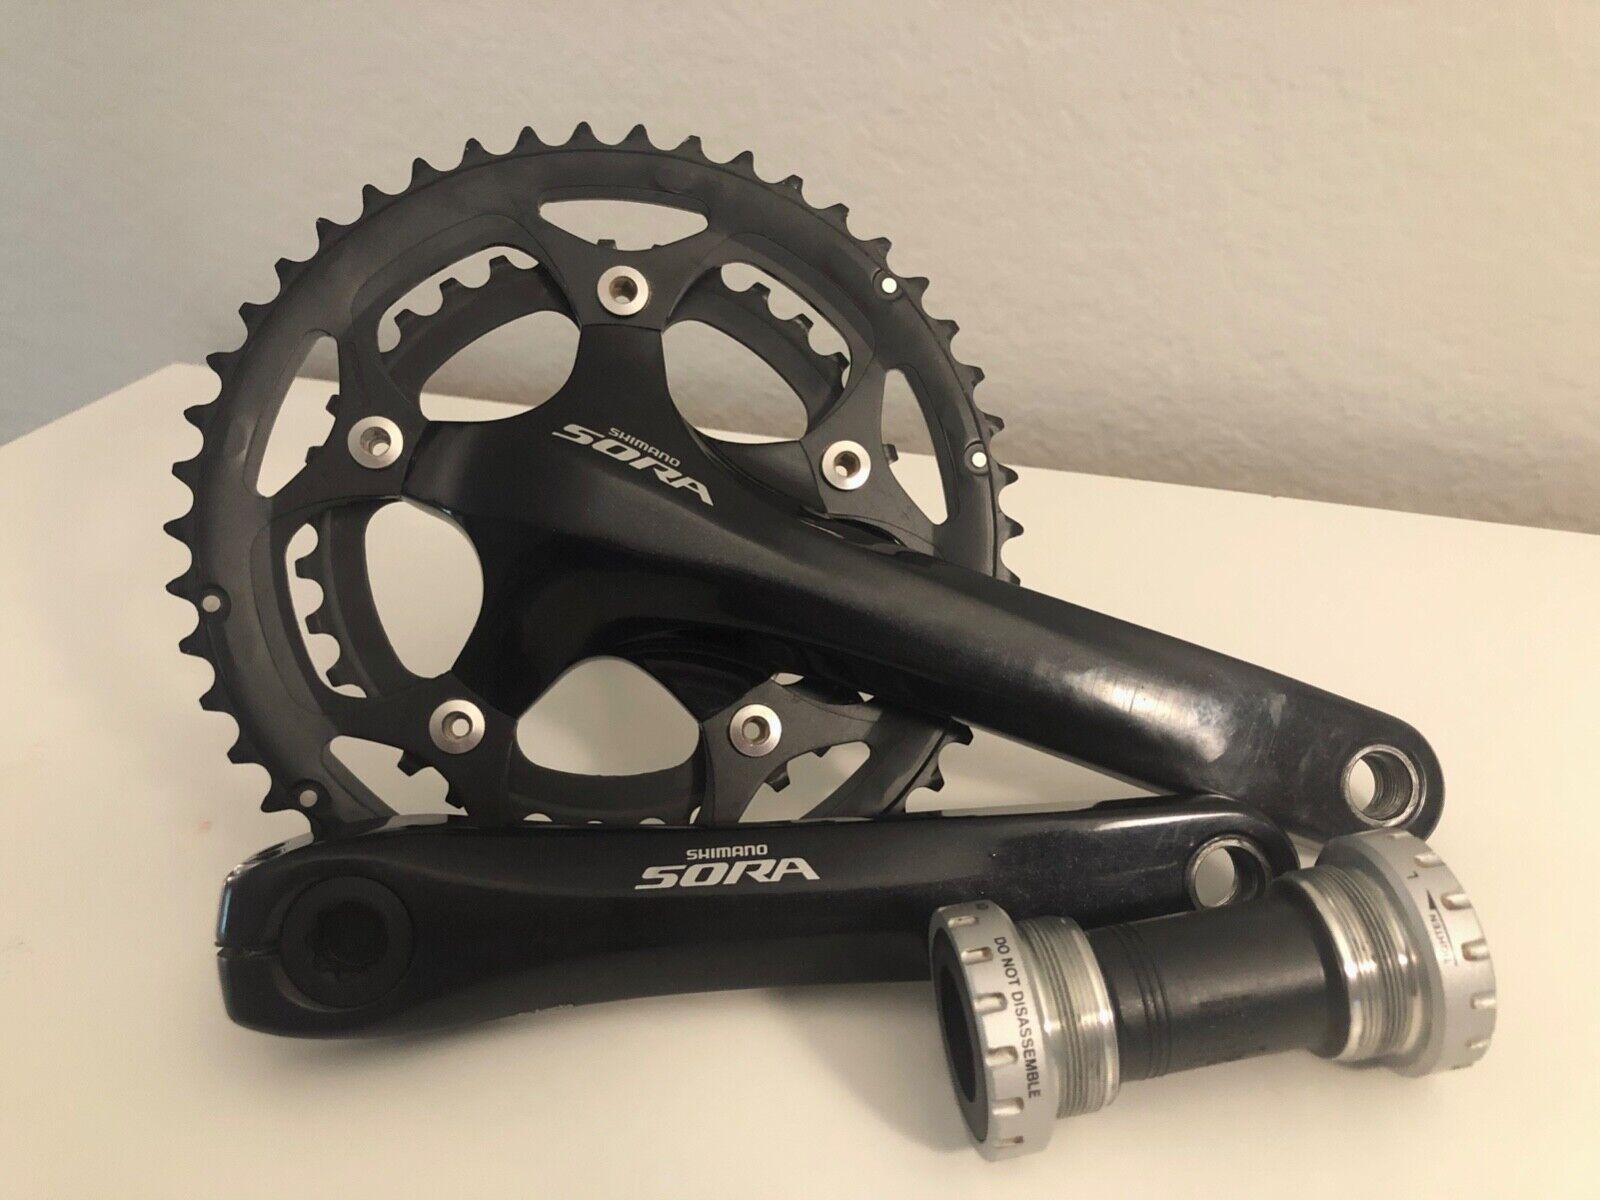 FSA Vero Road bike Compact Crankset 172.5mm 9 Speed 50T 34T 110BCD Square Taper